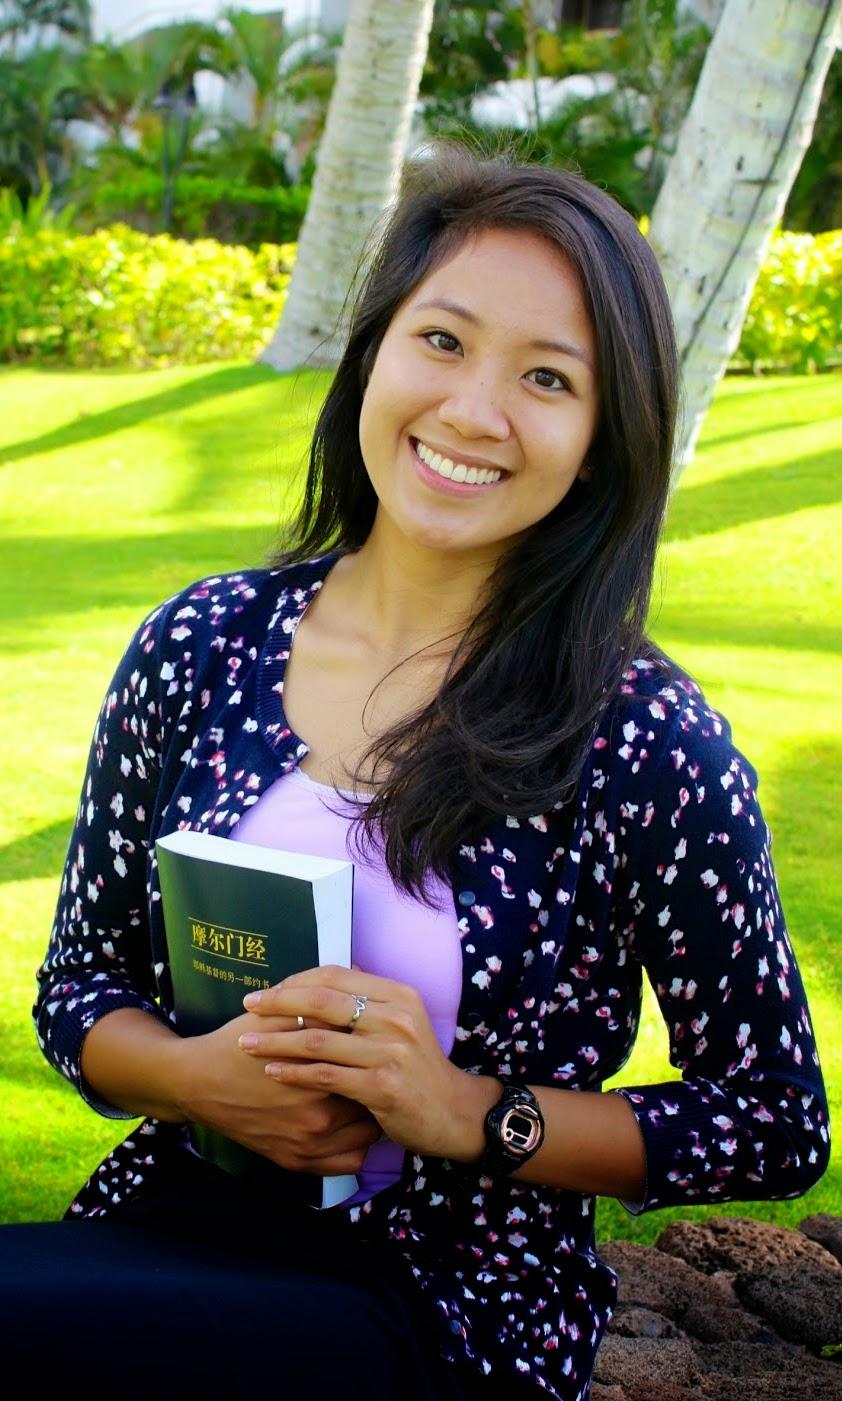 Sister Jessica Sagisi » I'm a Mormon